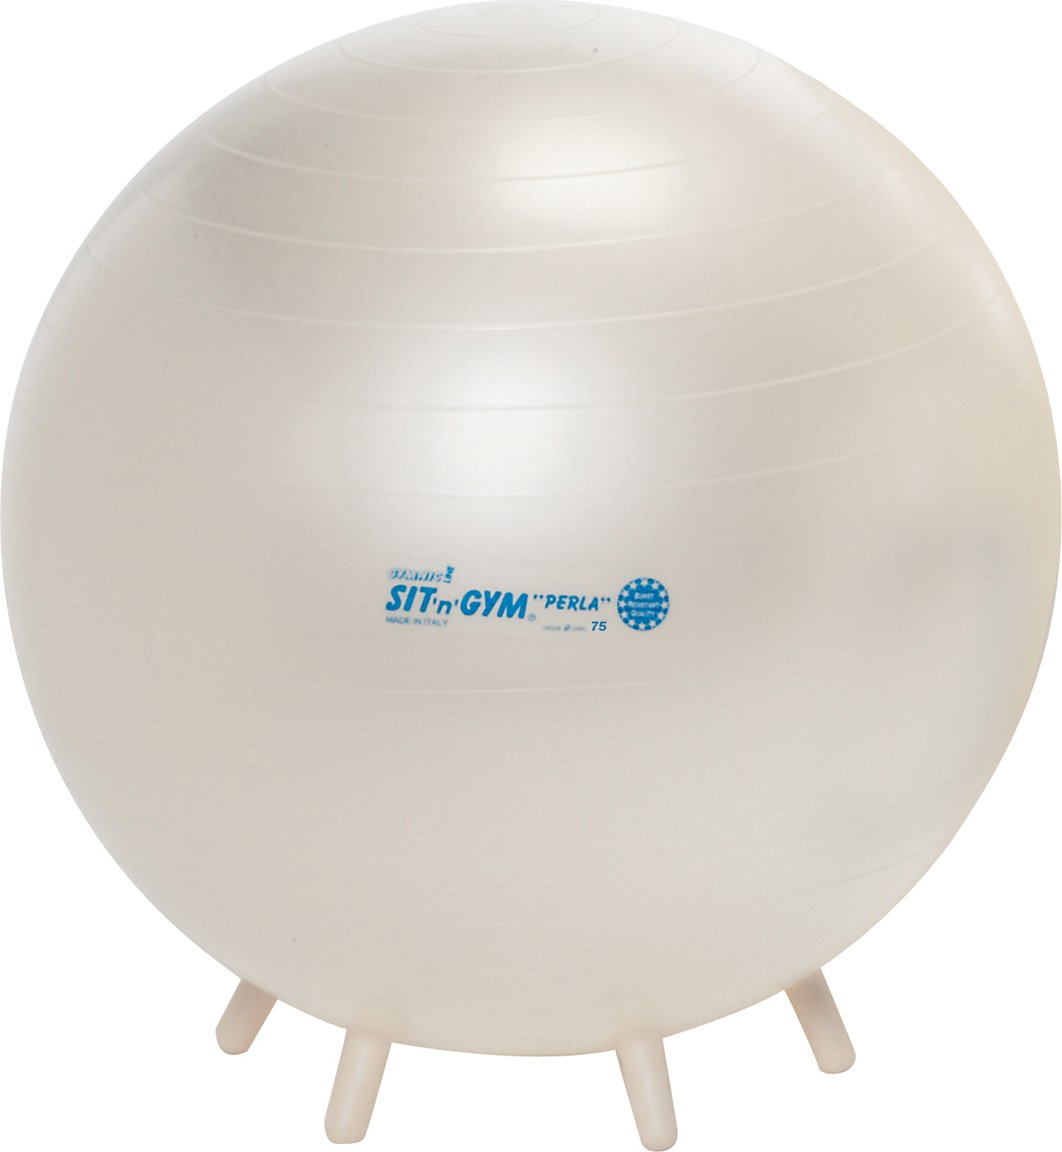 Gymnic Home & Office Anti Burst Swiss Ball